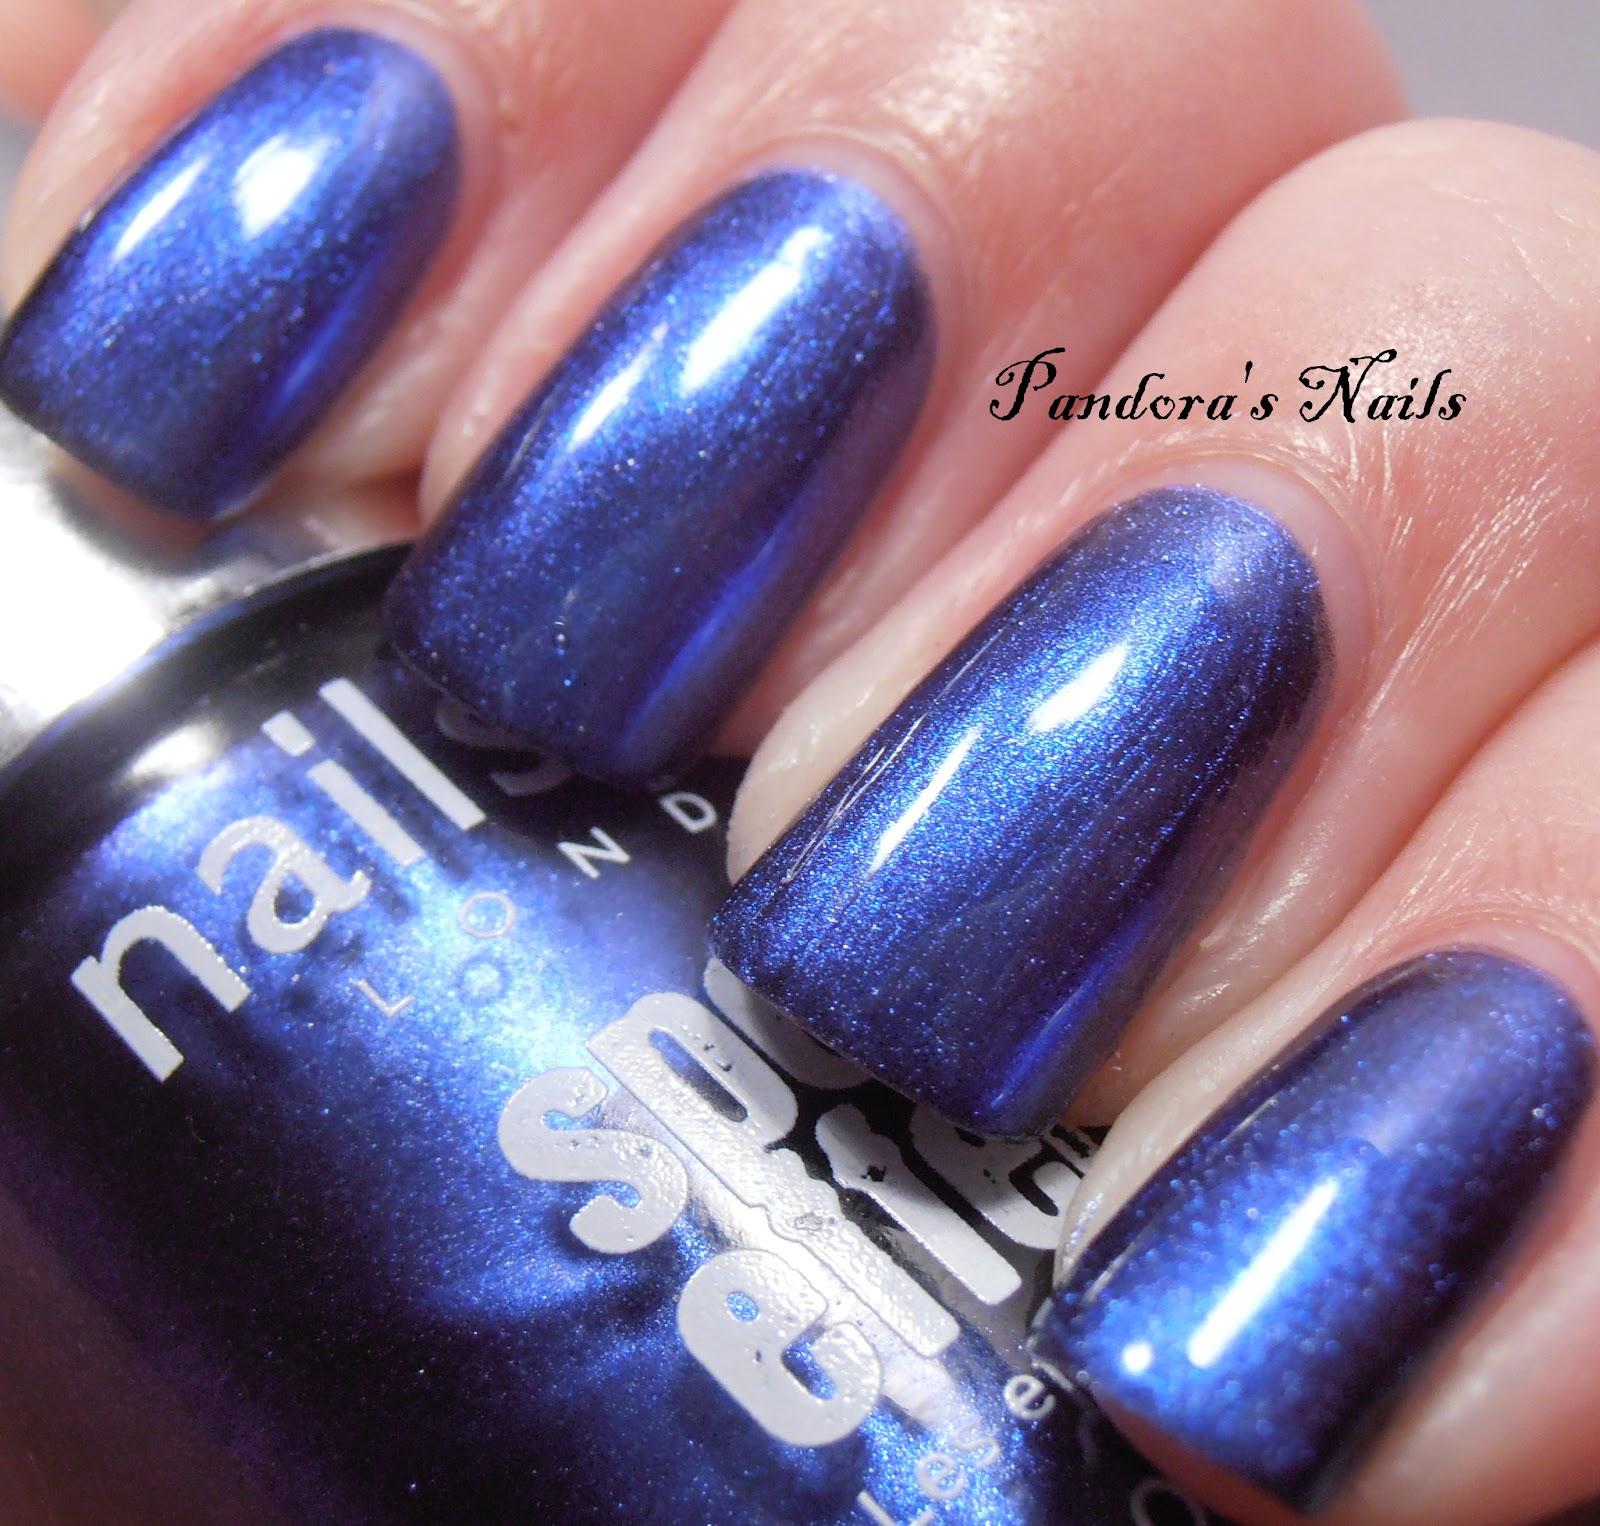 Pandora's Nails: Nails Inc Primrose Park Mirror Metallic